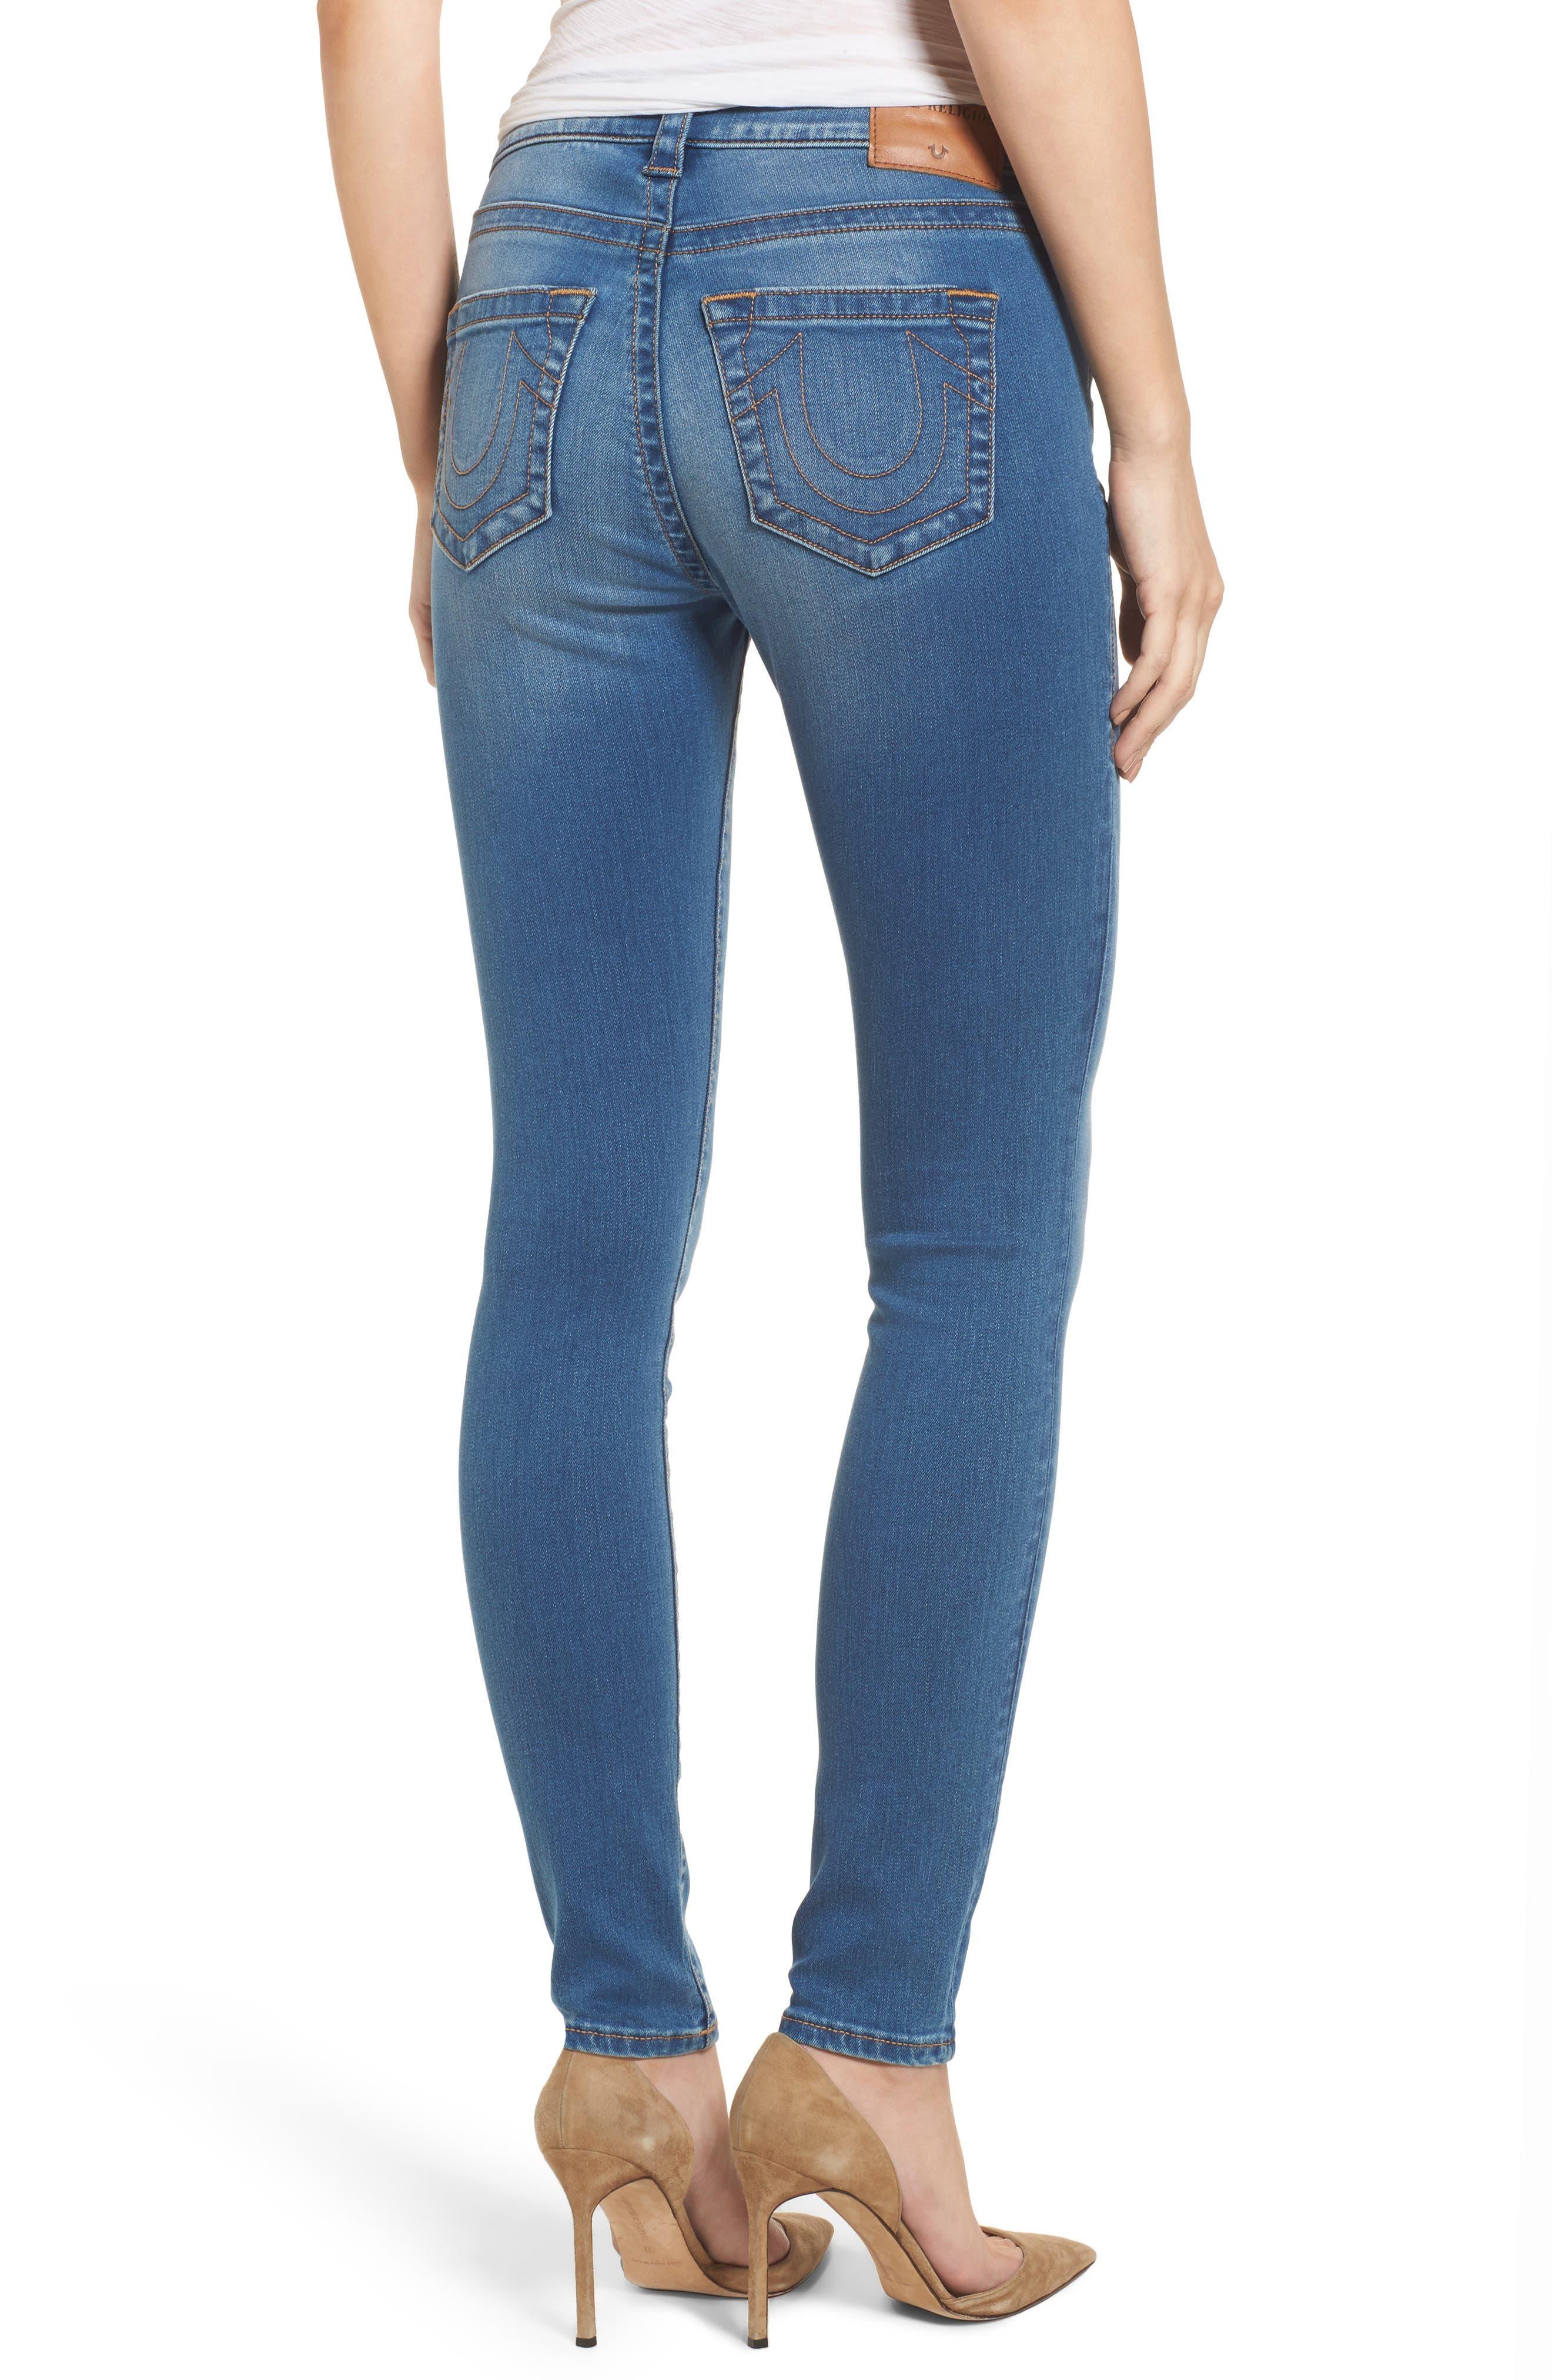 Jennie Curvy Skinny Jeans,                             Alternate thumbnail 2, color,                             Nu Authentic Indigo